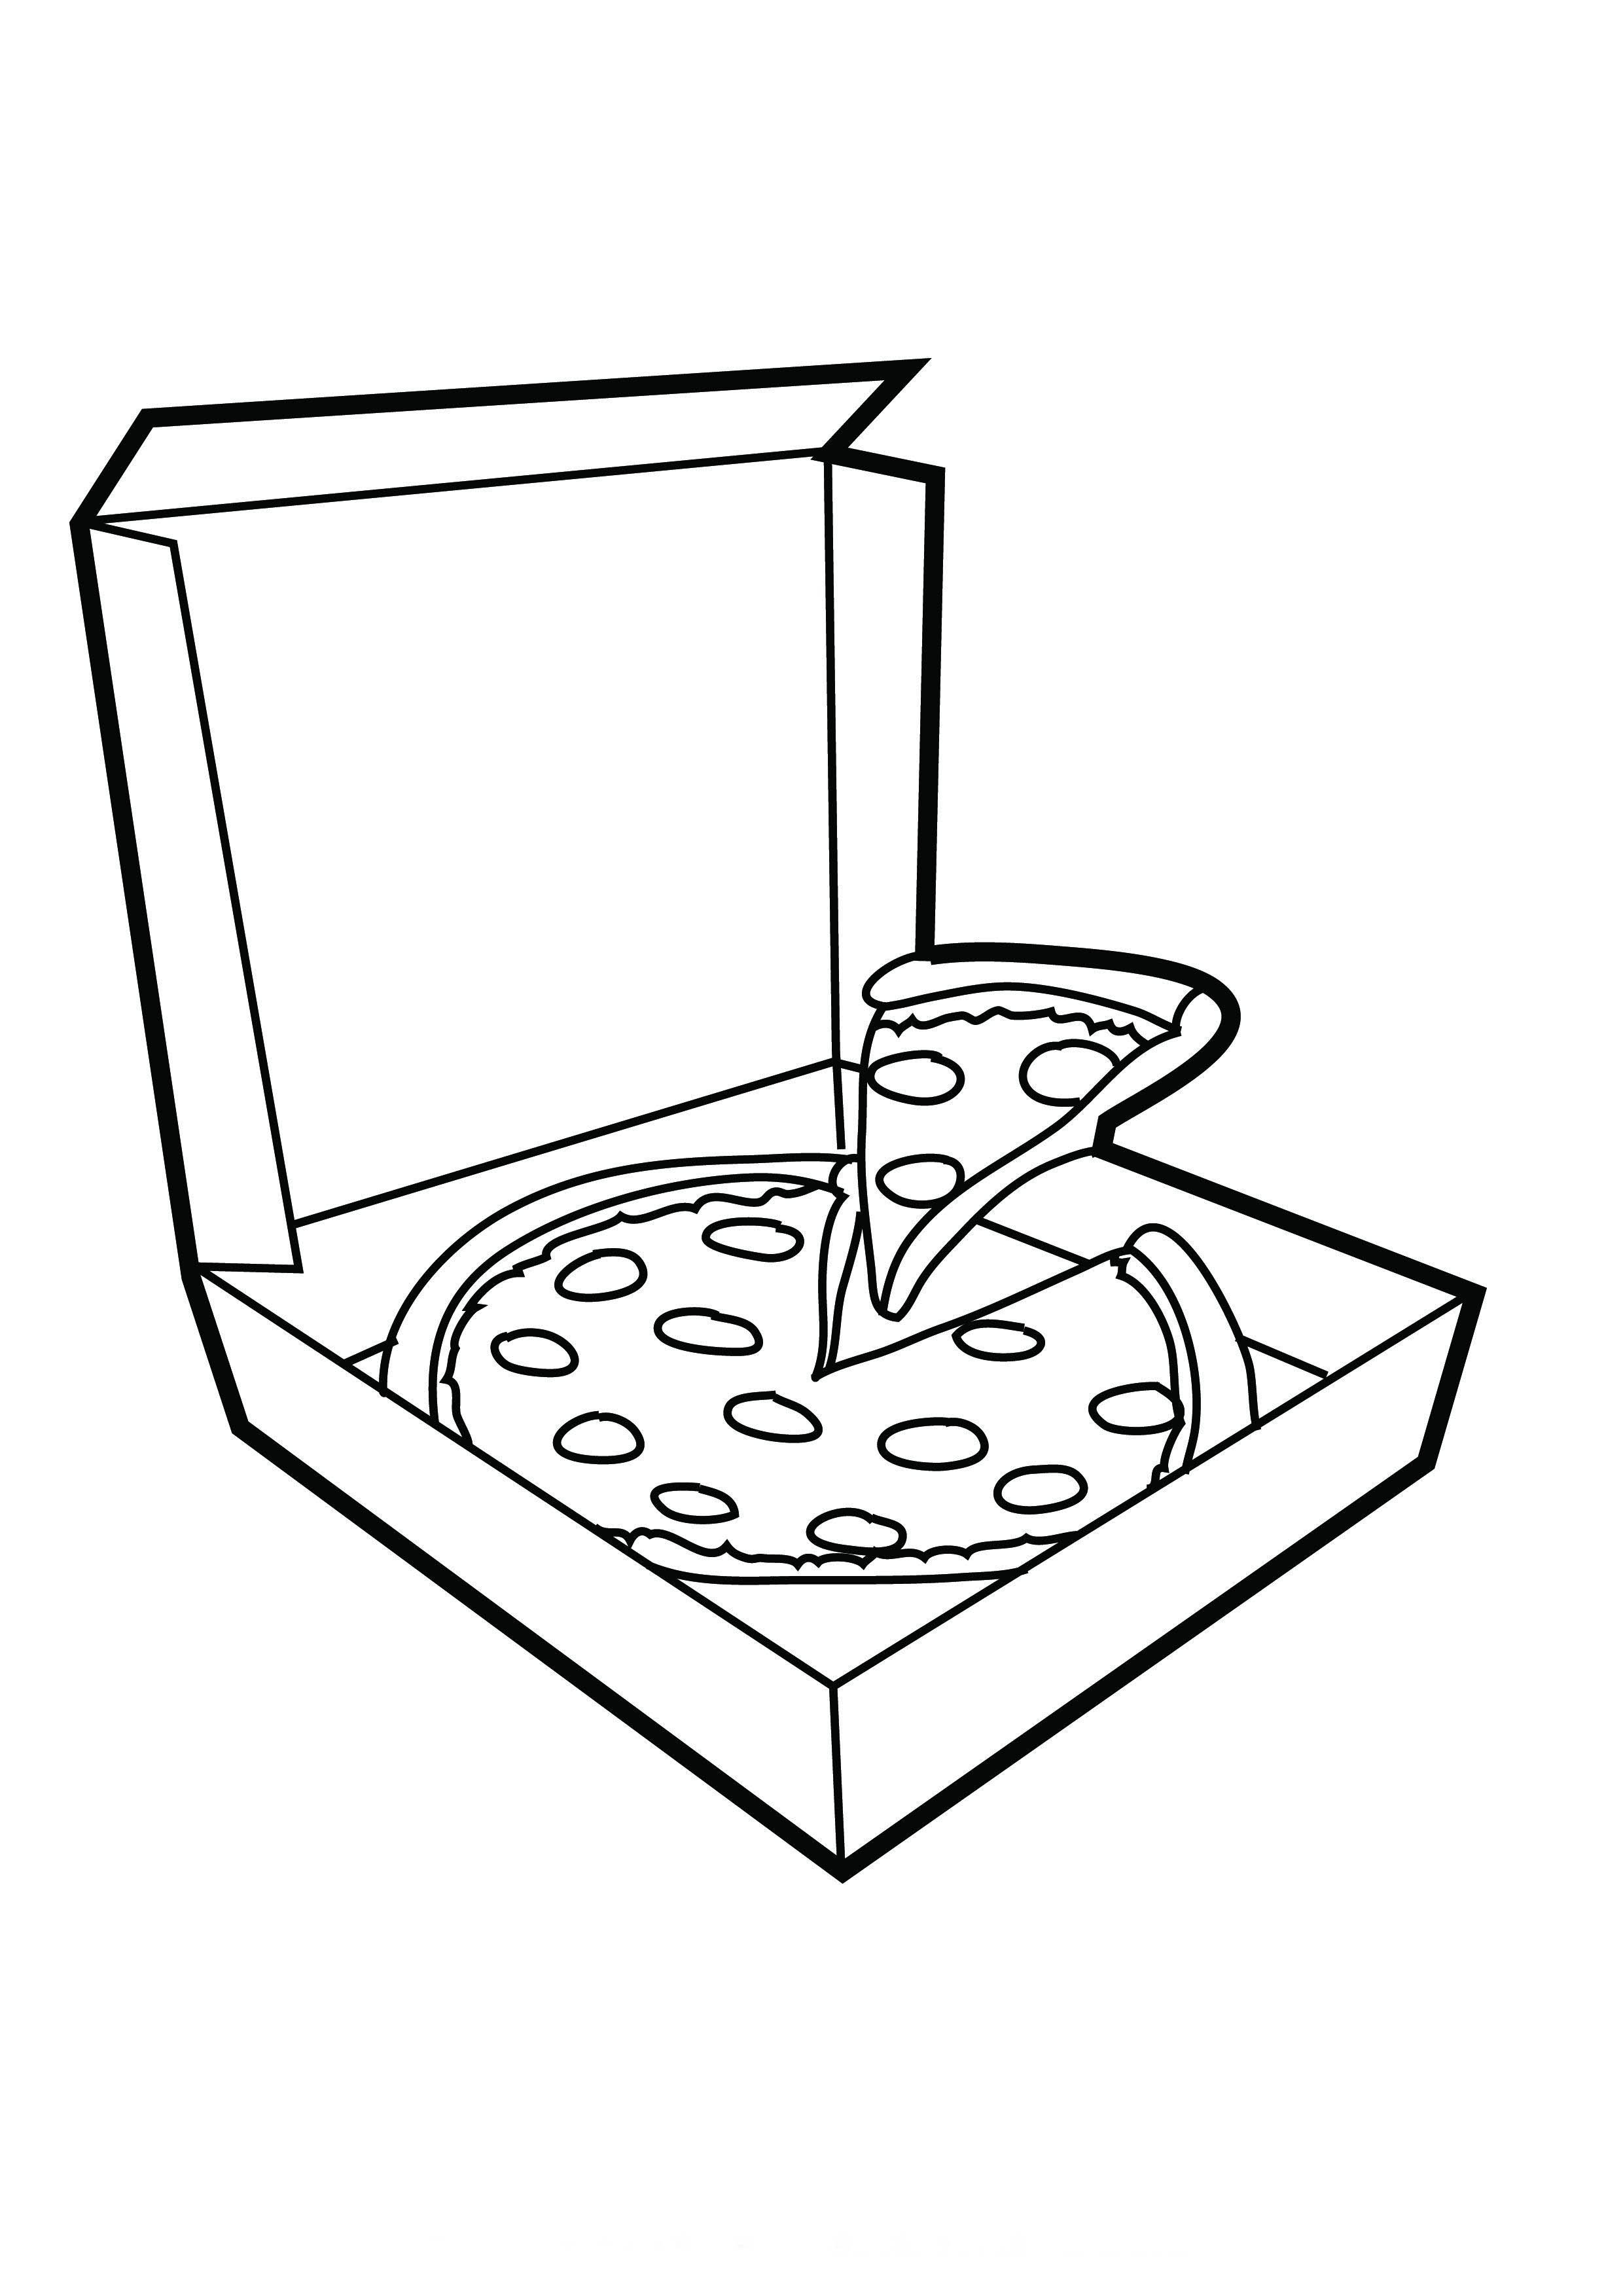 Desenho De Caixa De Pizza Para Colorir